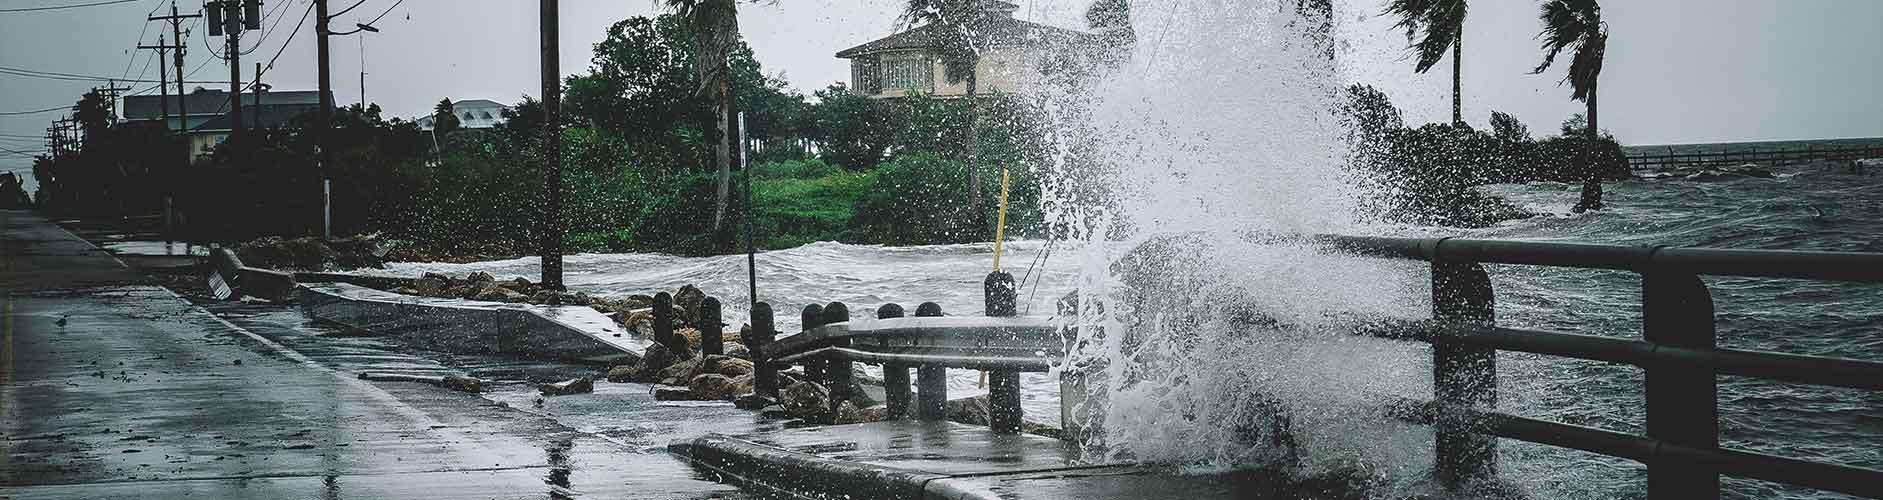 natural-disasters.jpg